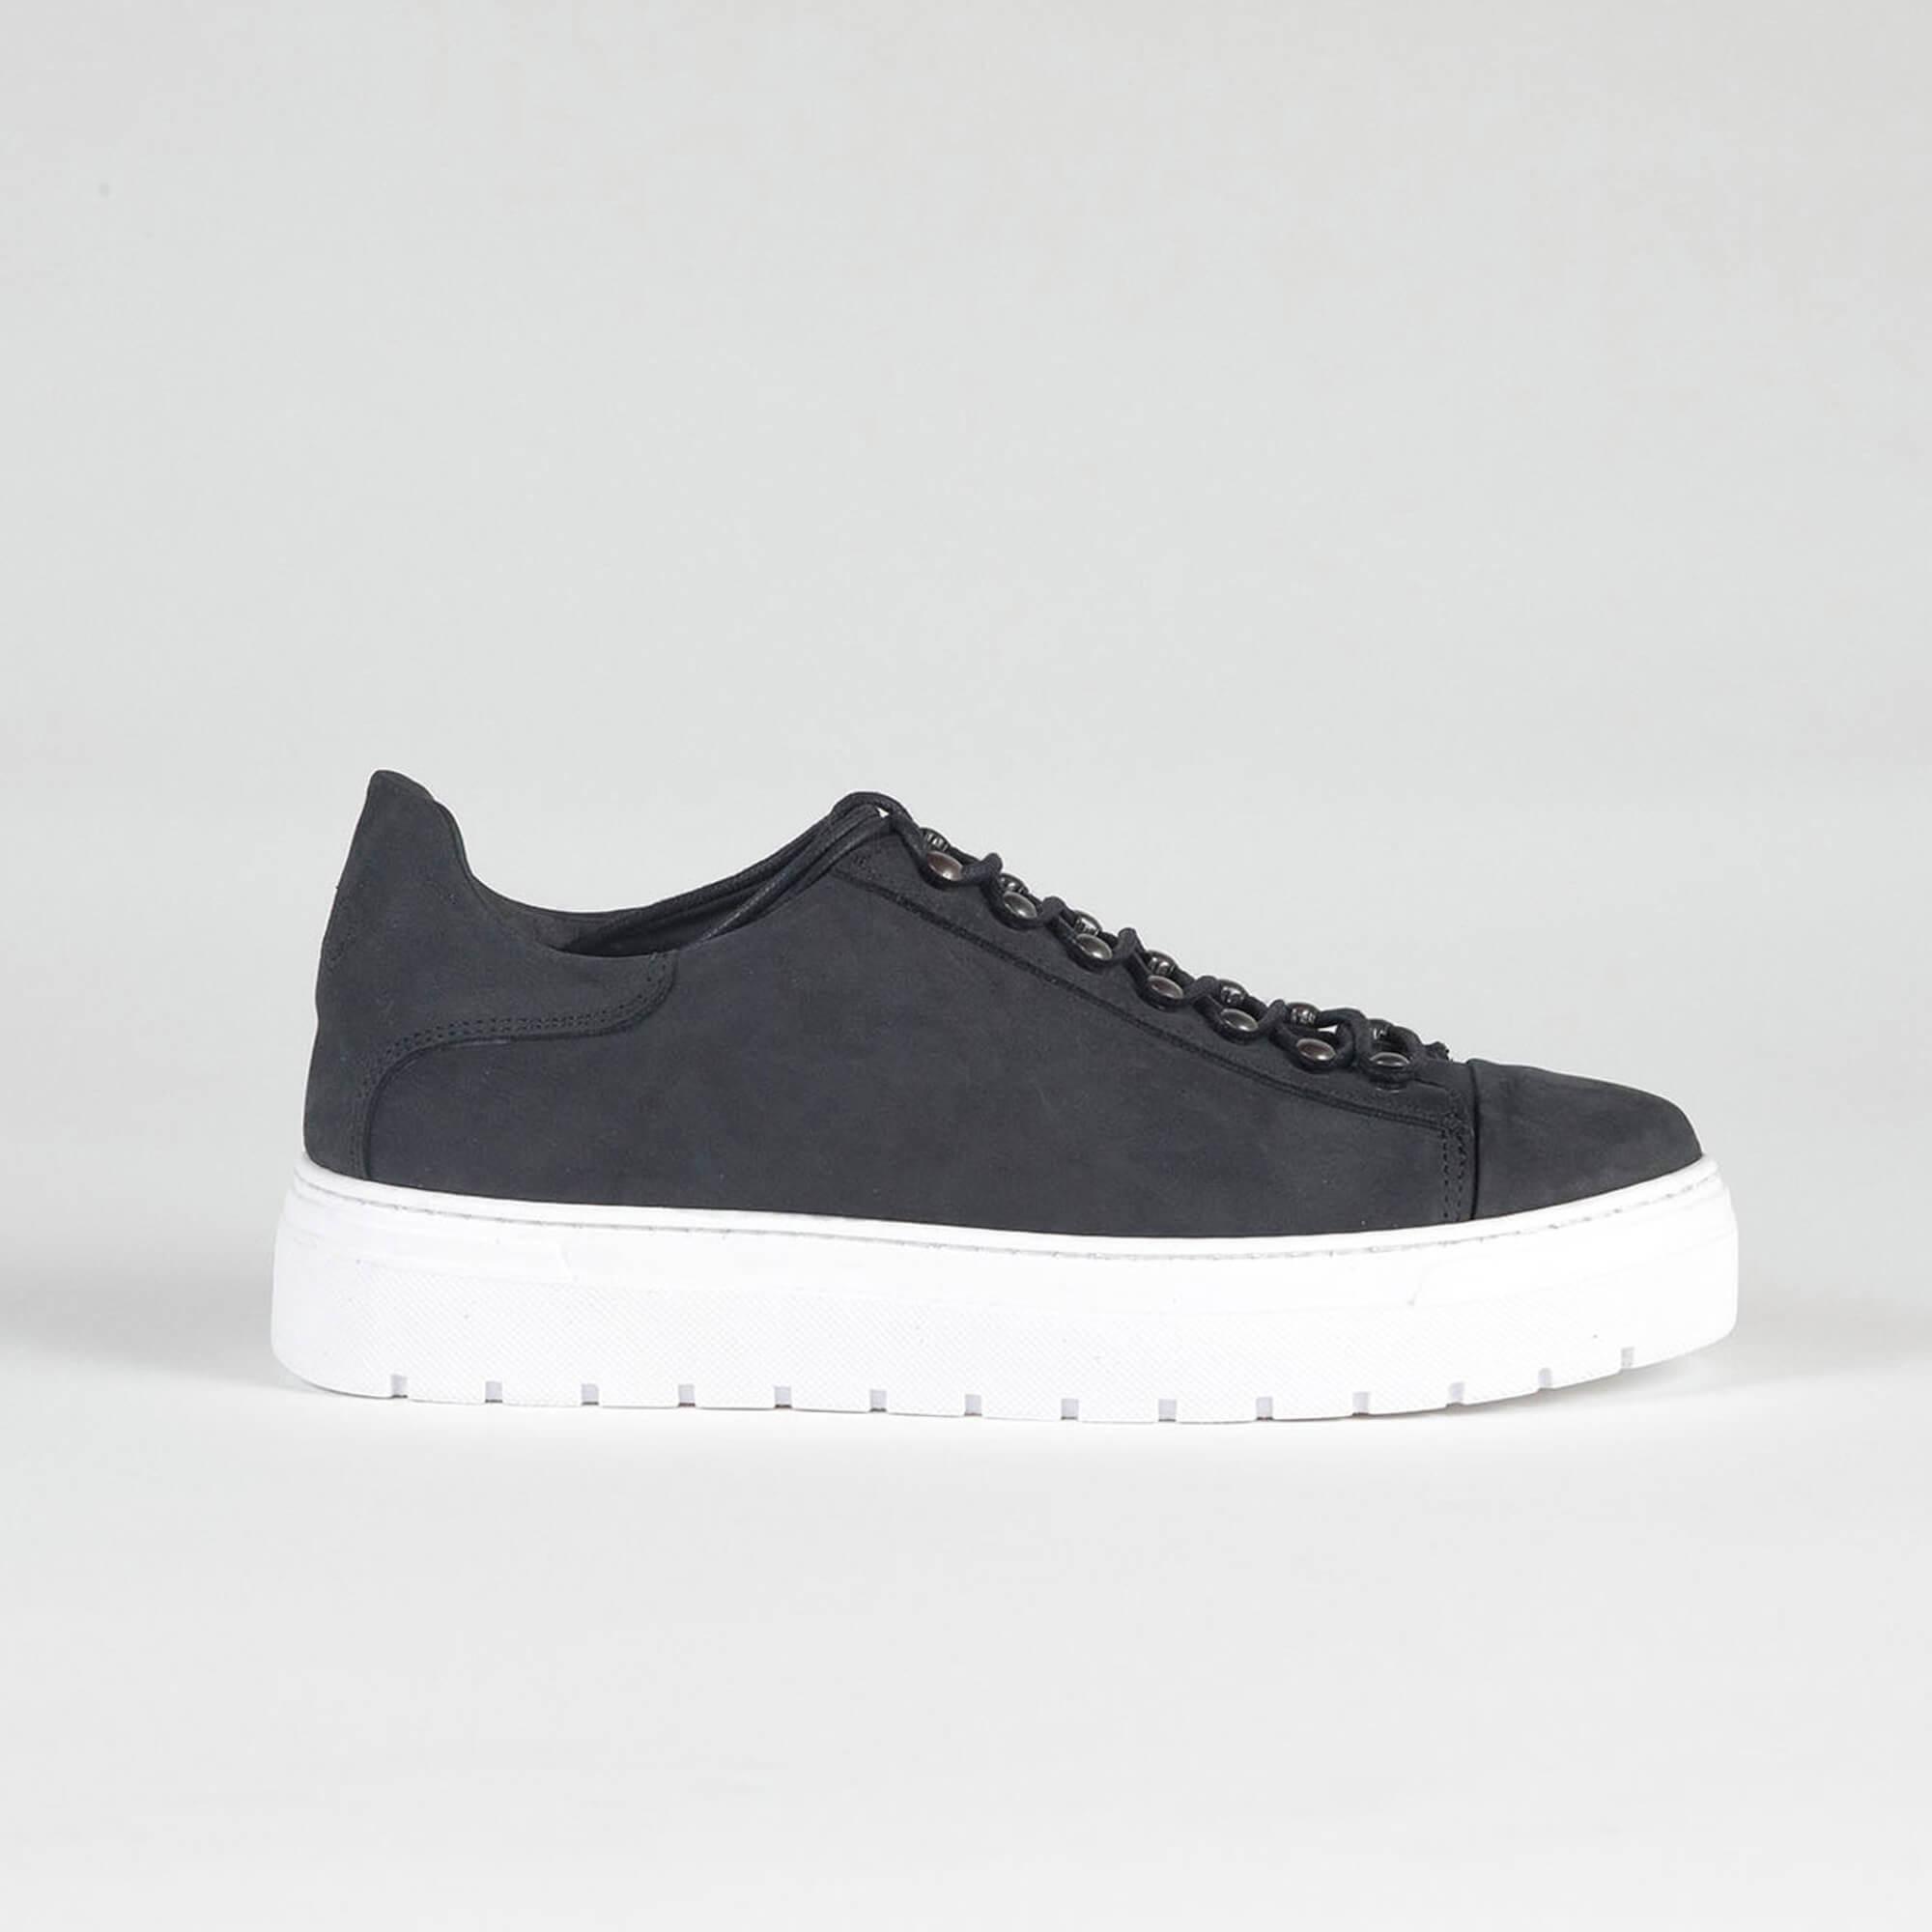 sneakers low black side